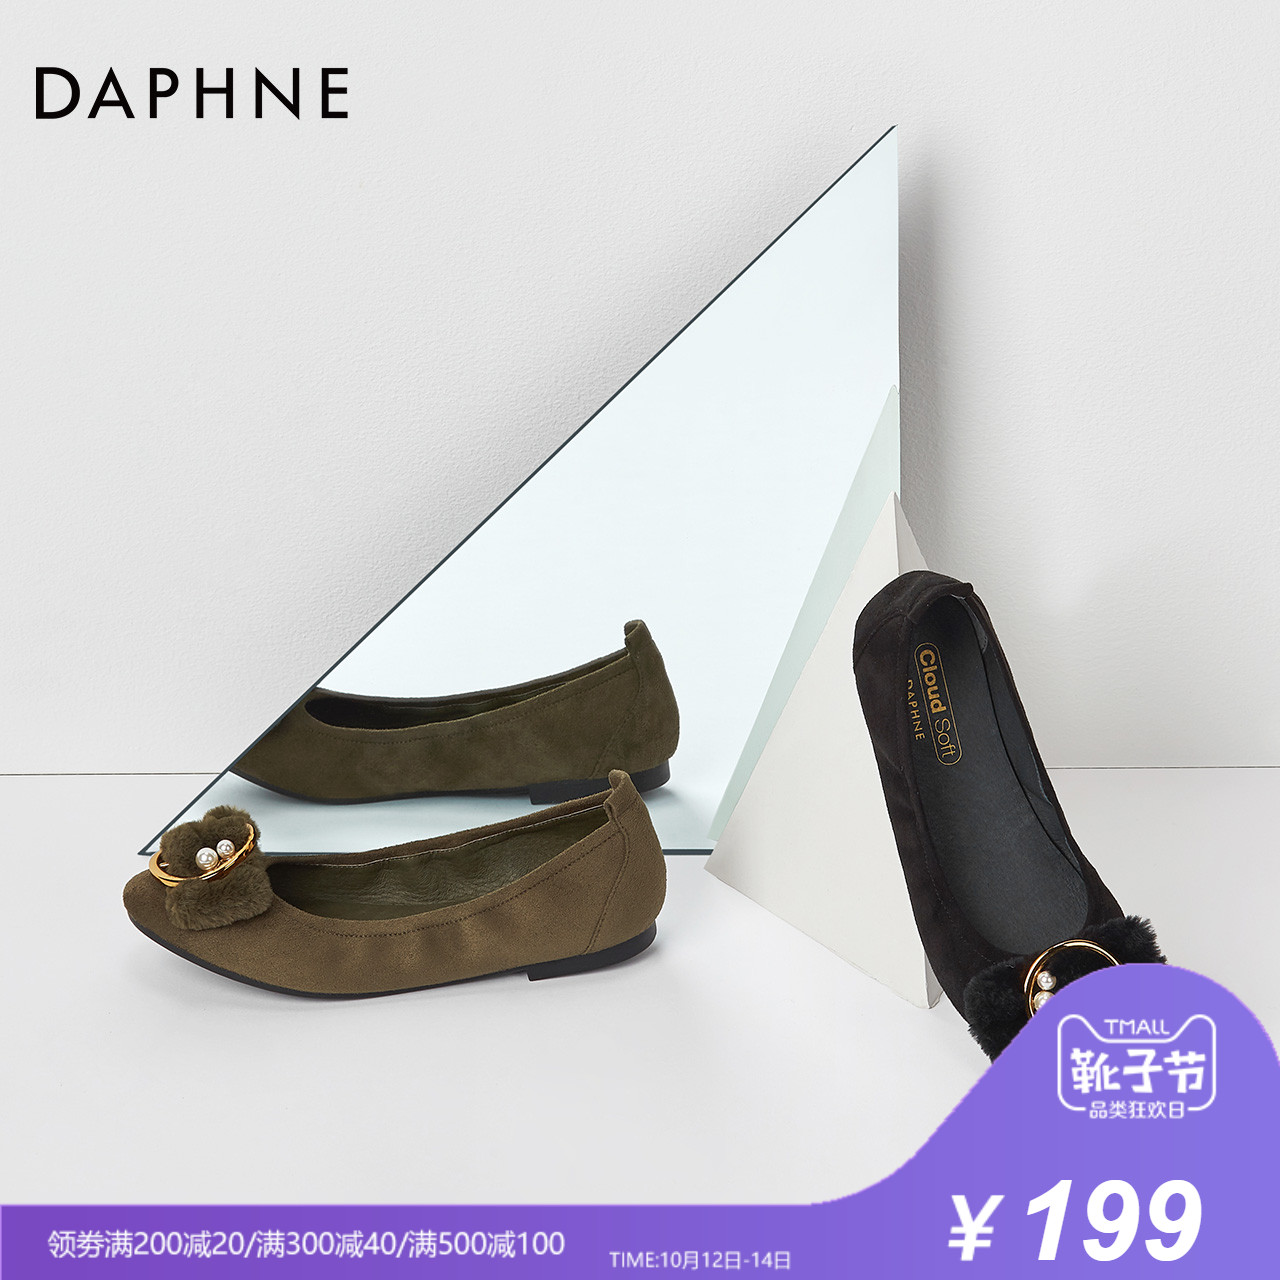 Daphne-达芙妮2018秋新款简约圆头平底鞋时尚金属圆扣毛毛单鞋女